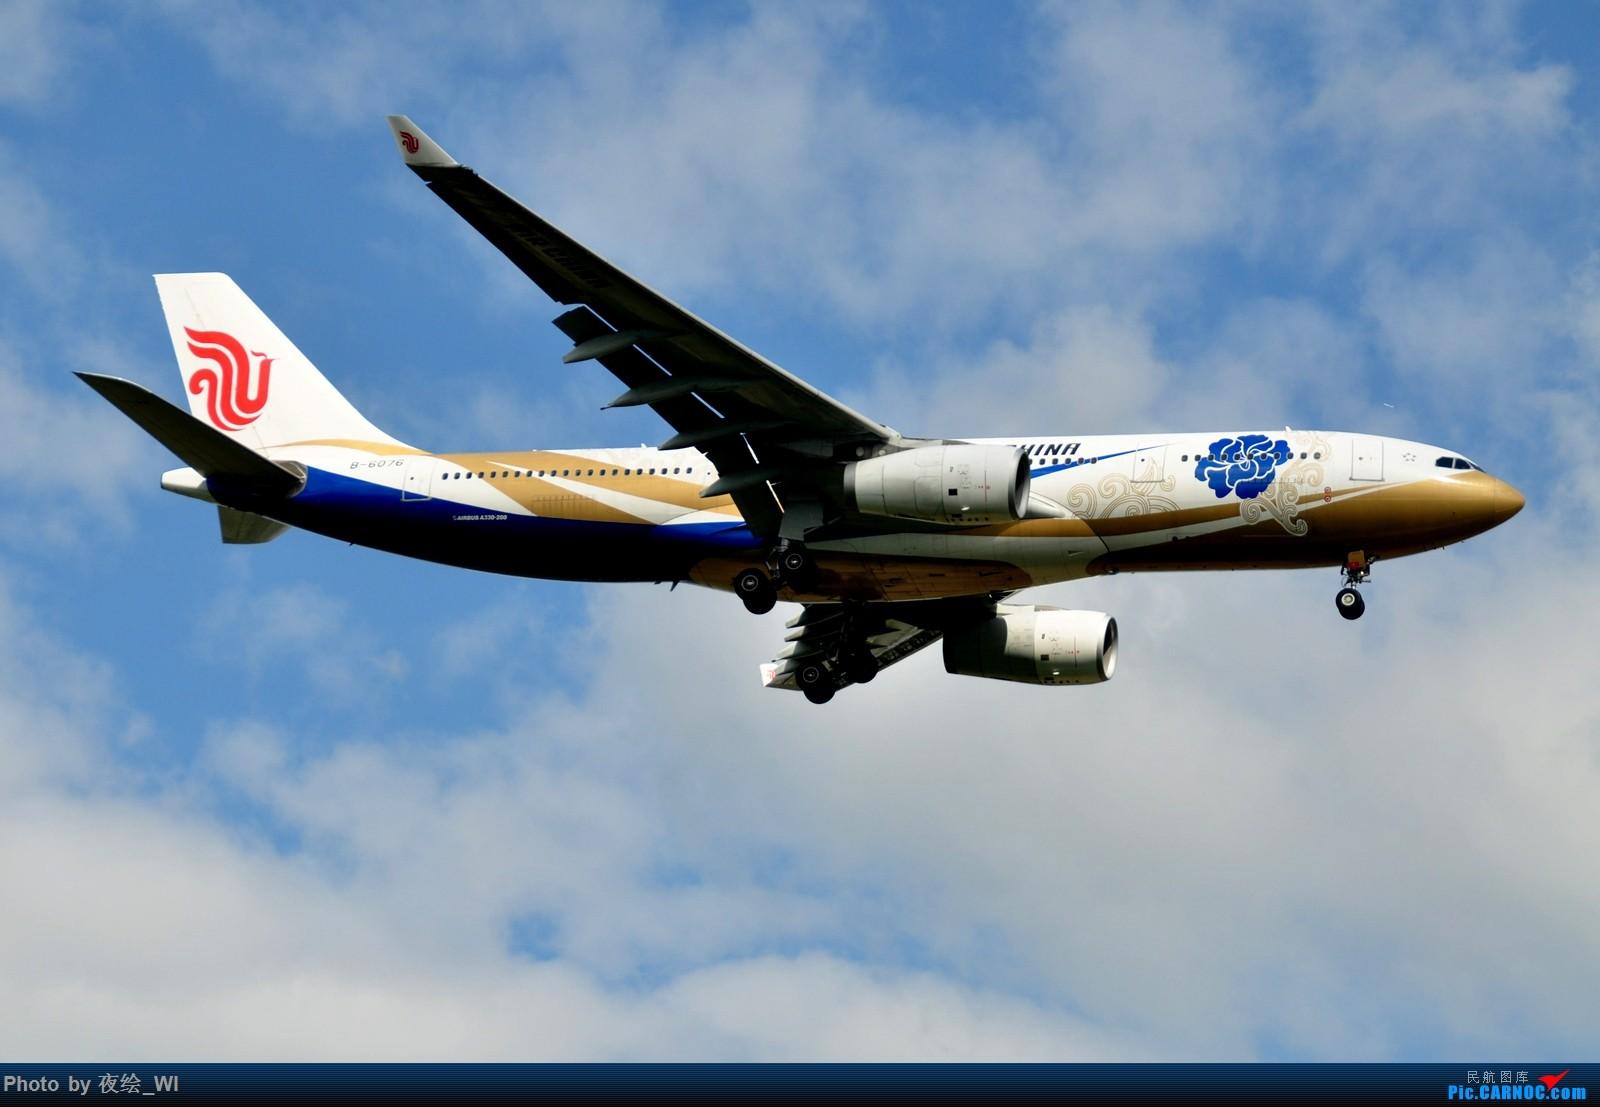 Re:[原创]【PVG】不只守着NKG,国庆疯狂拍机之浦东行,天空美得简直不像话! AIRBUS A330-200 B-6076 中国上海浦东国际机场